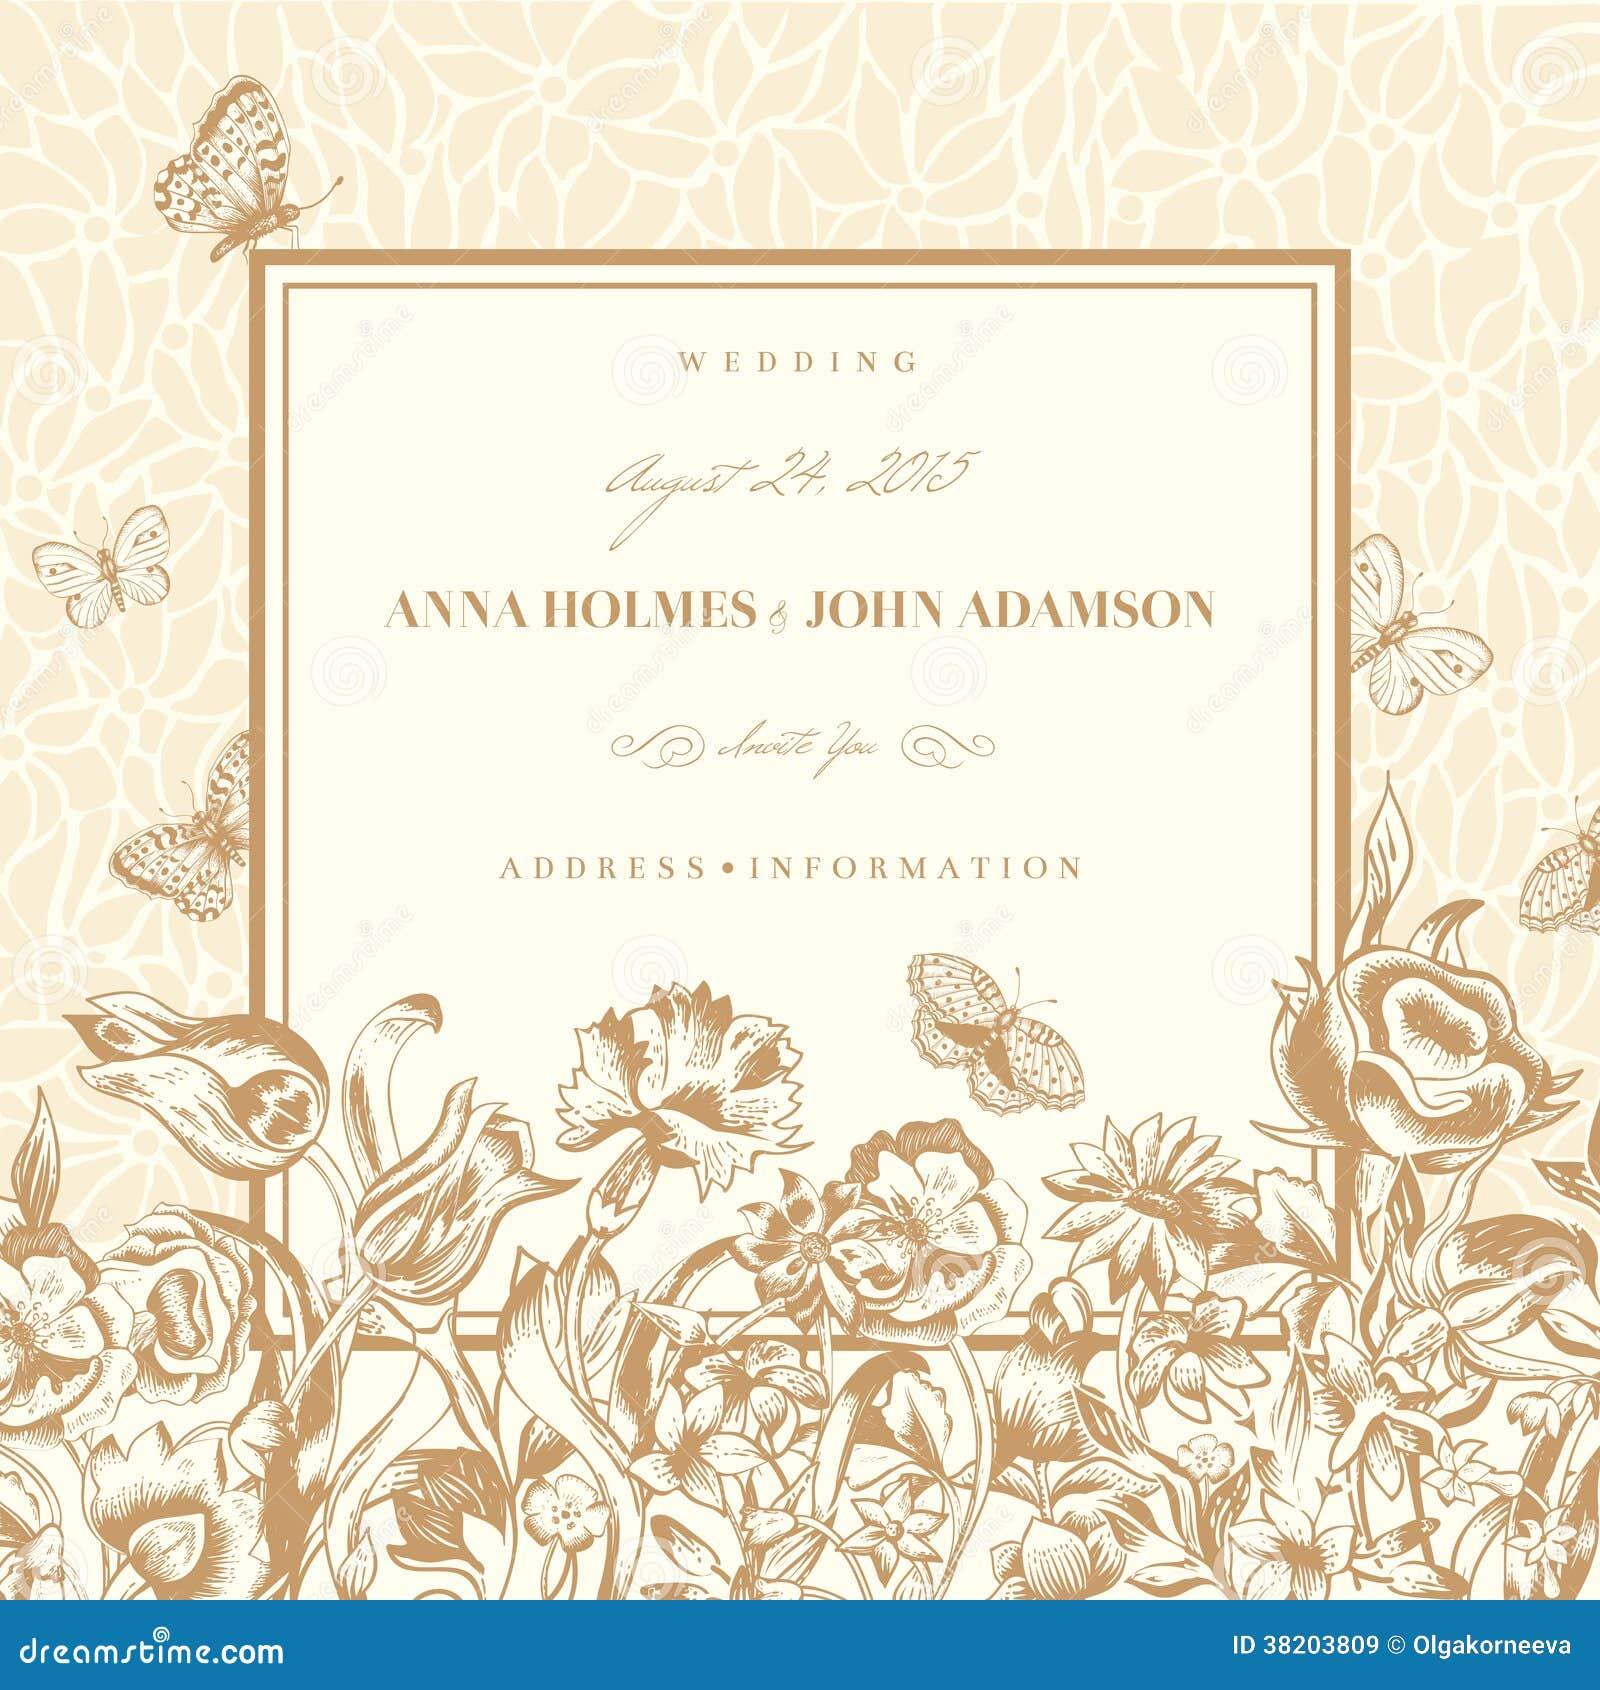 wedding card with a light beige vintage background cartoon vector